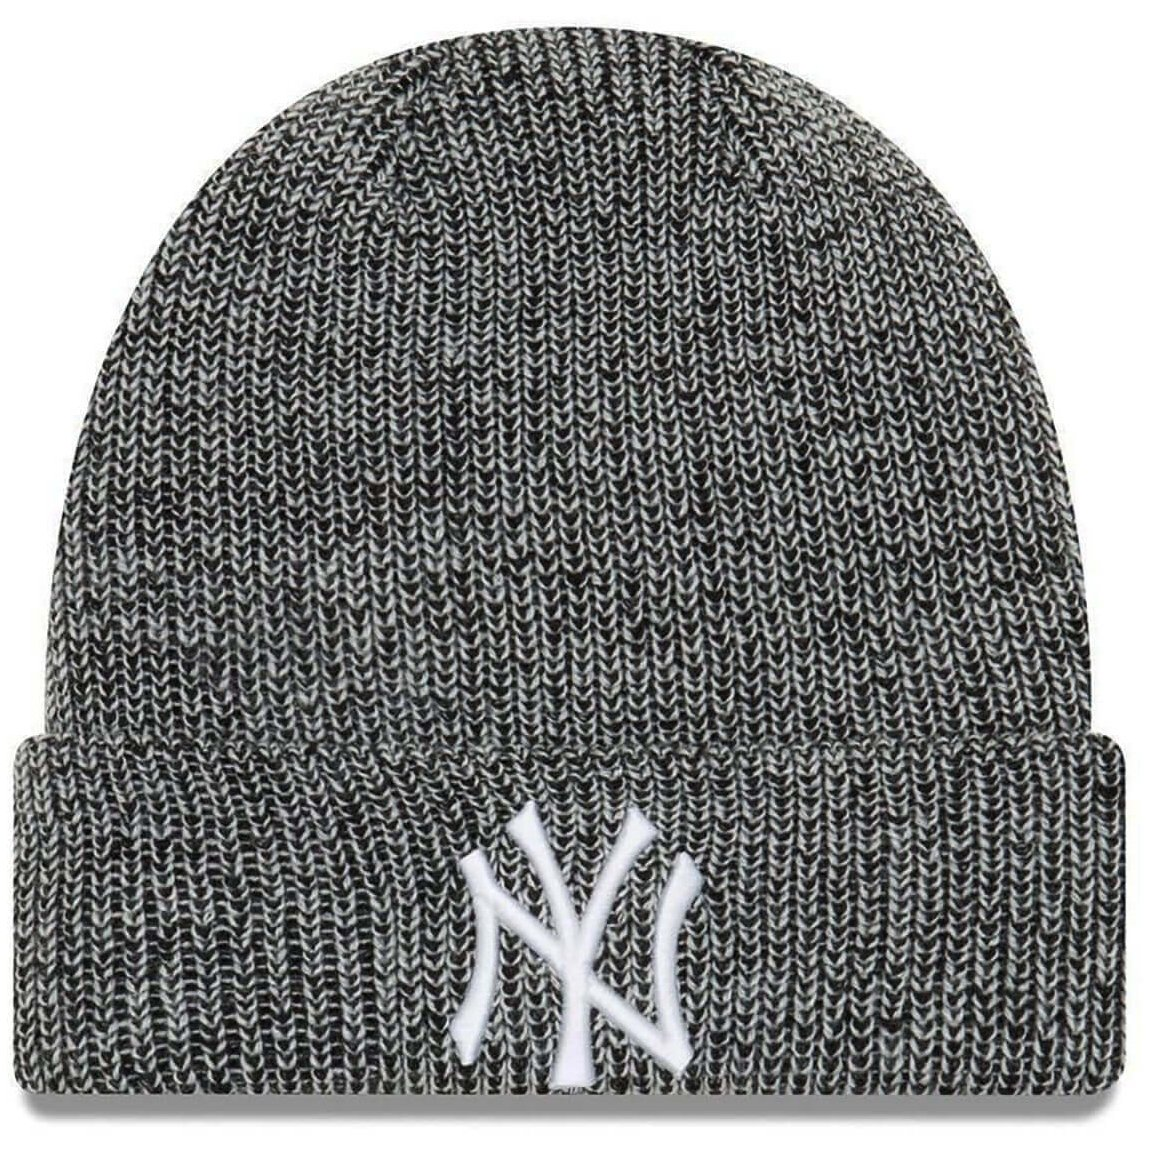 4d5a33fc410dd Touca New Era Mlb Ny Yankees Chiller - Compre Agora